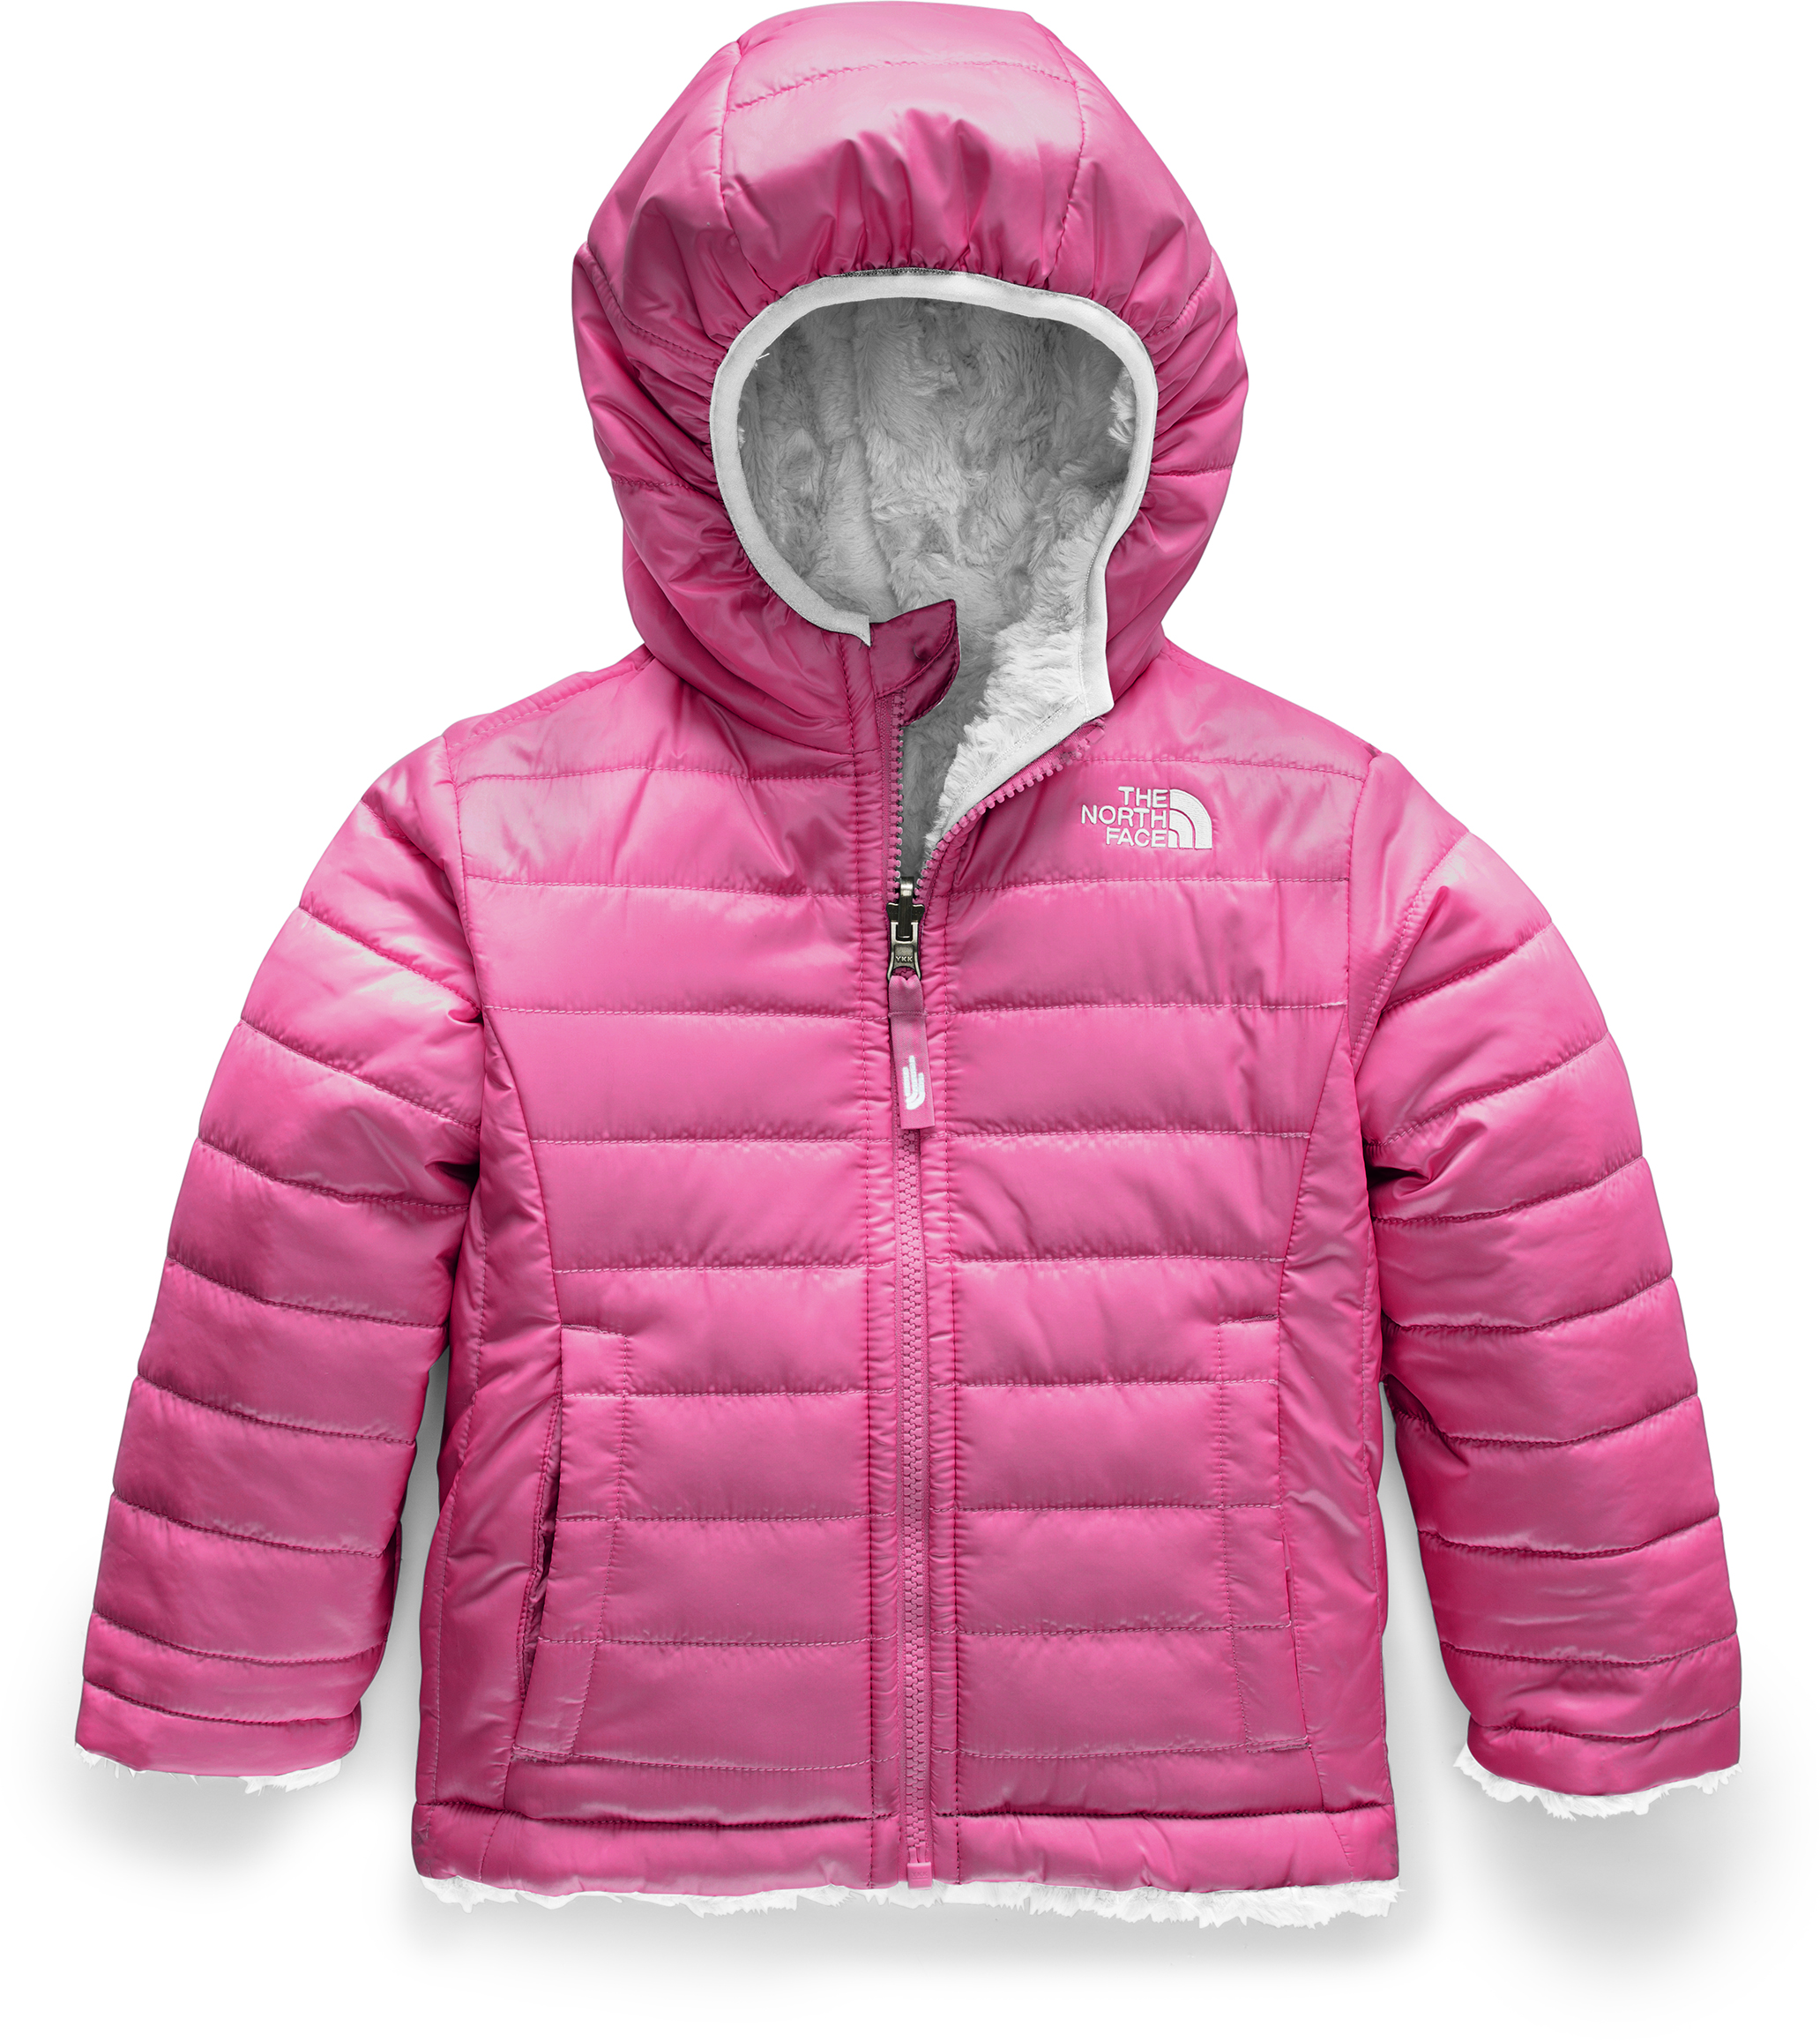 237093b60 The North Face Reversible Mossbud Swirl Jacket - Girls' - Children